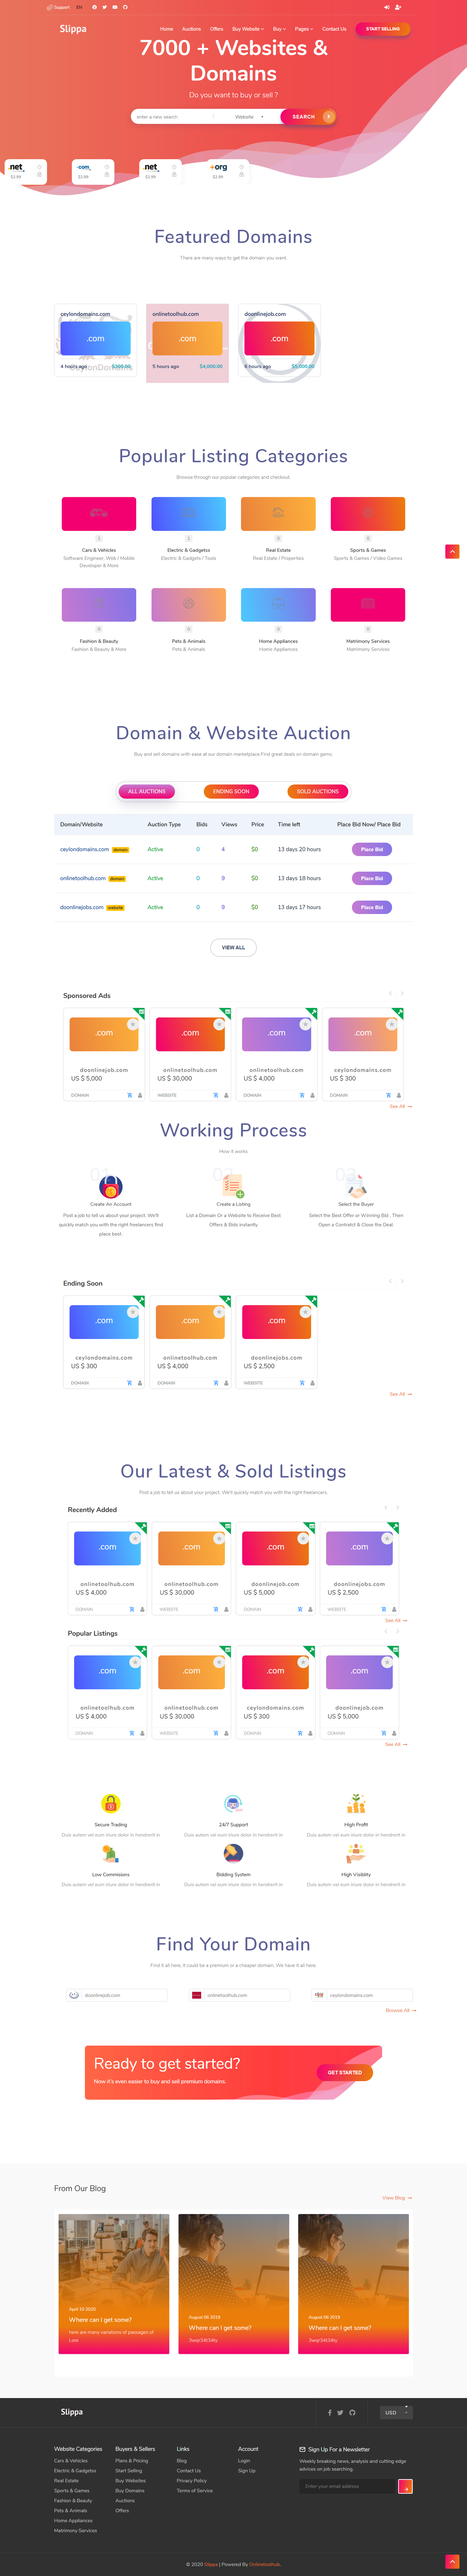 Slippa - Domains,Website & App Marketplace PHP Script Download